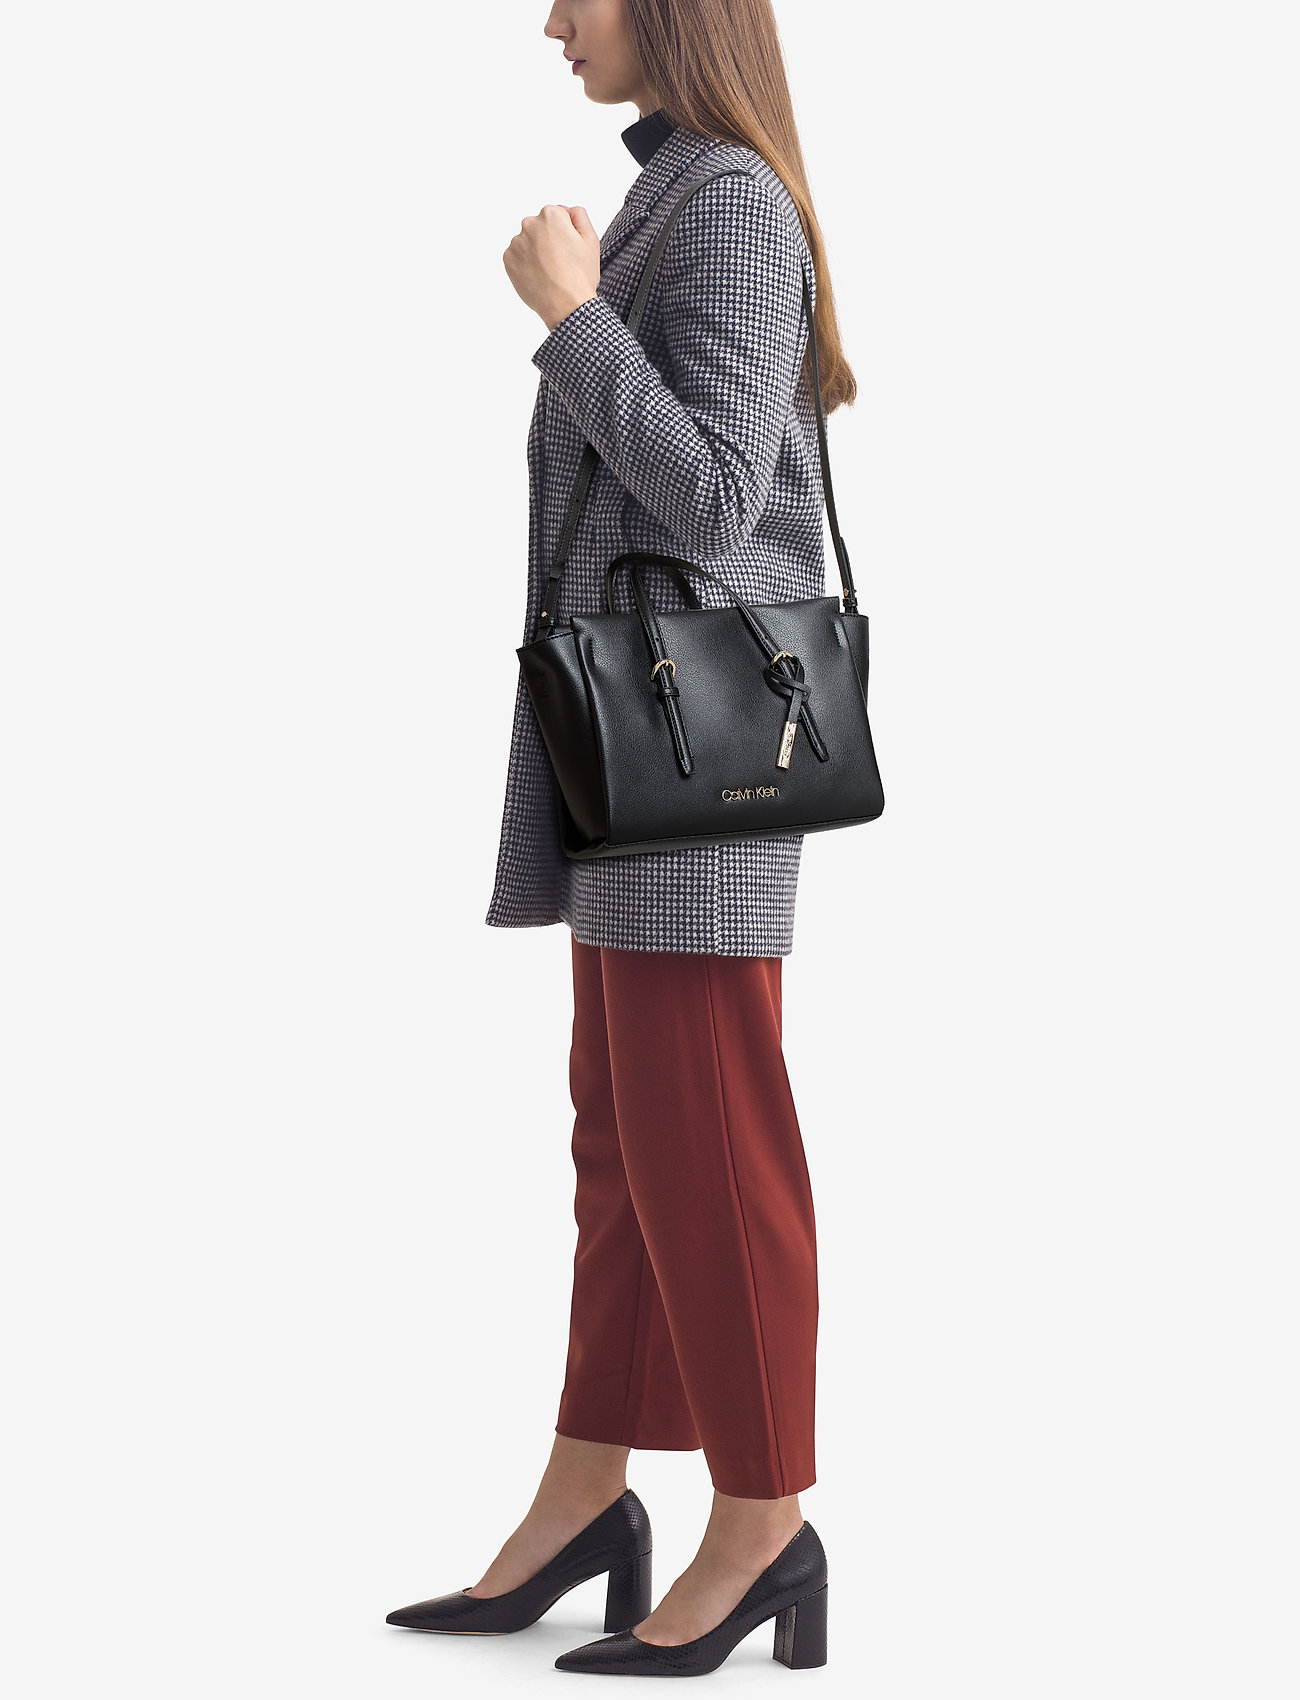 f1604ae3e2 Calvin Klein Avant Small Tote (Black), (116.94 €) | Large selection ...